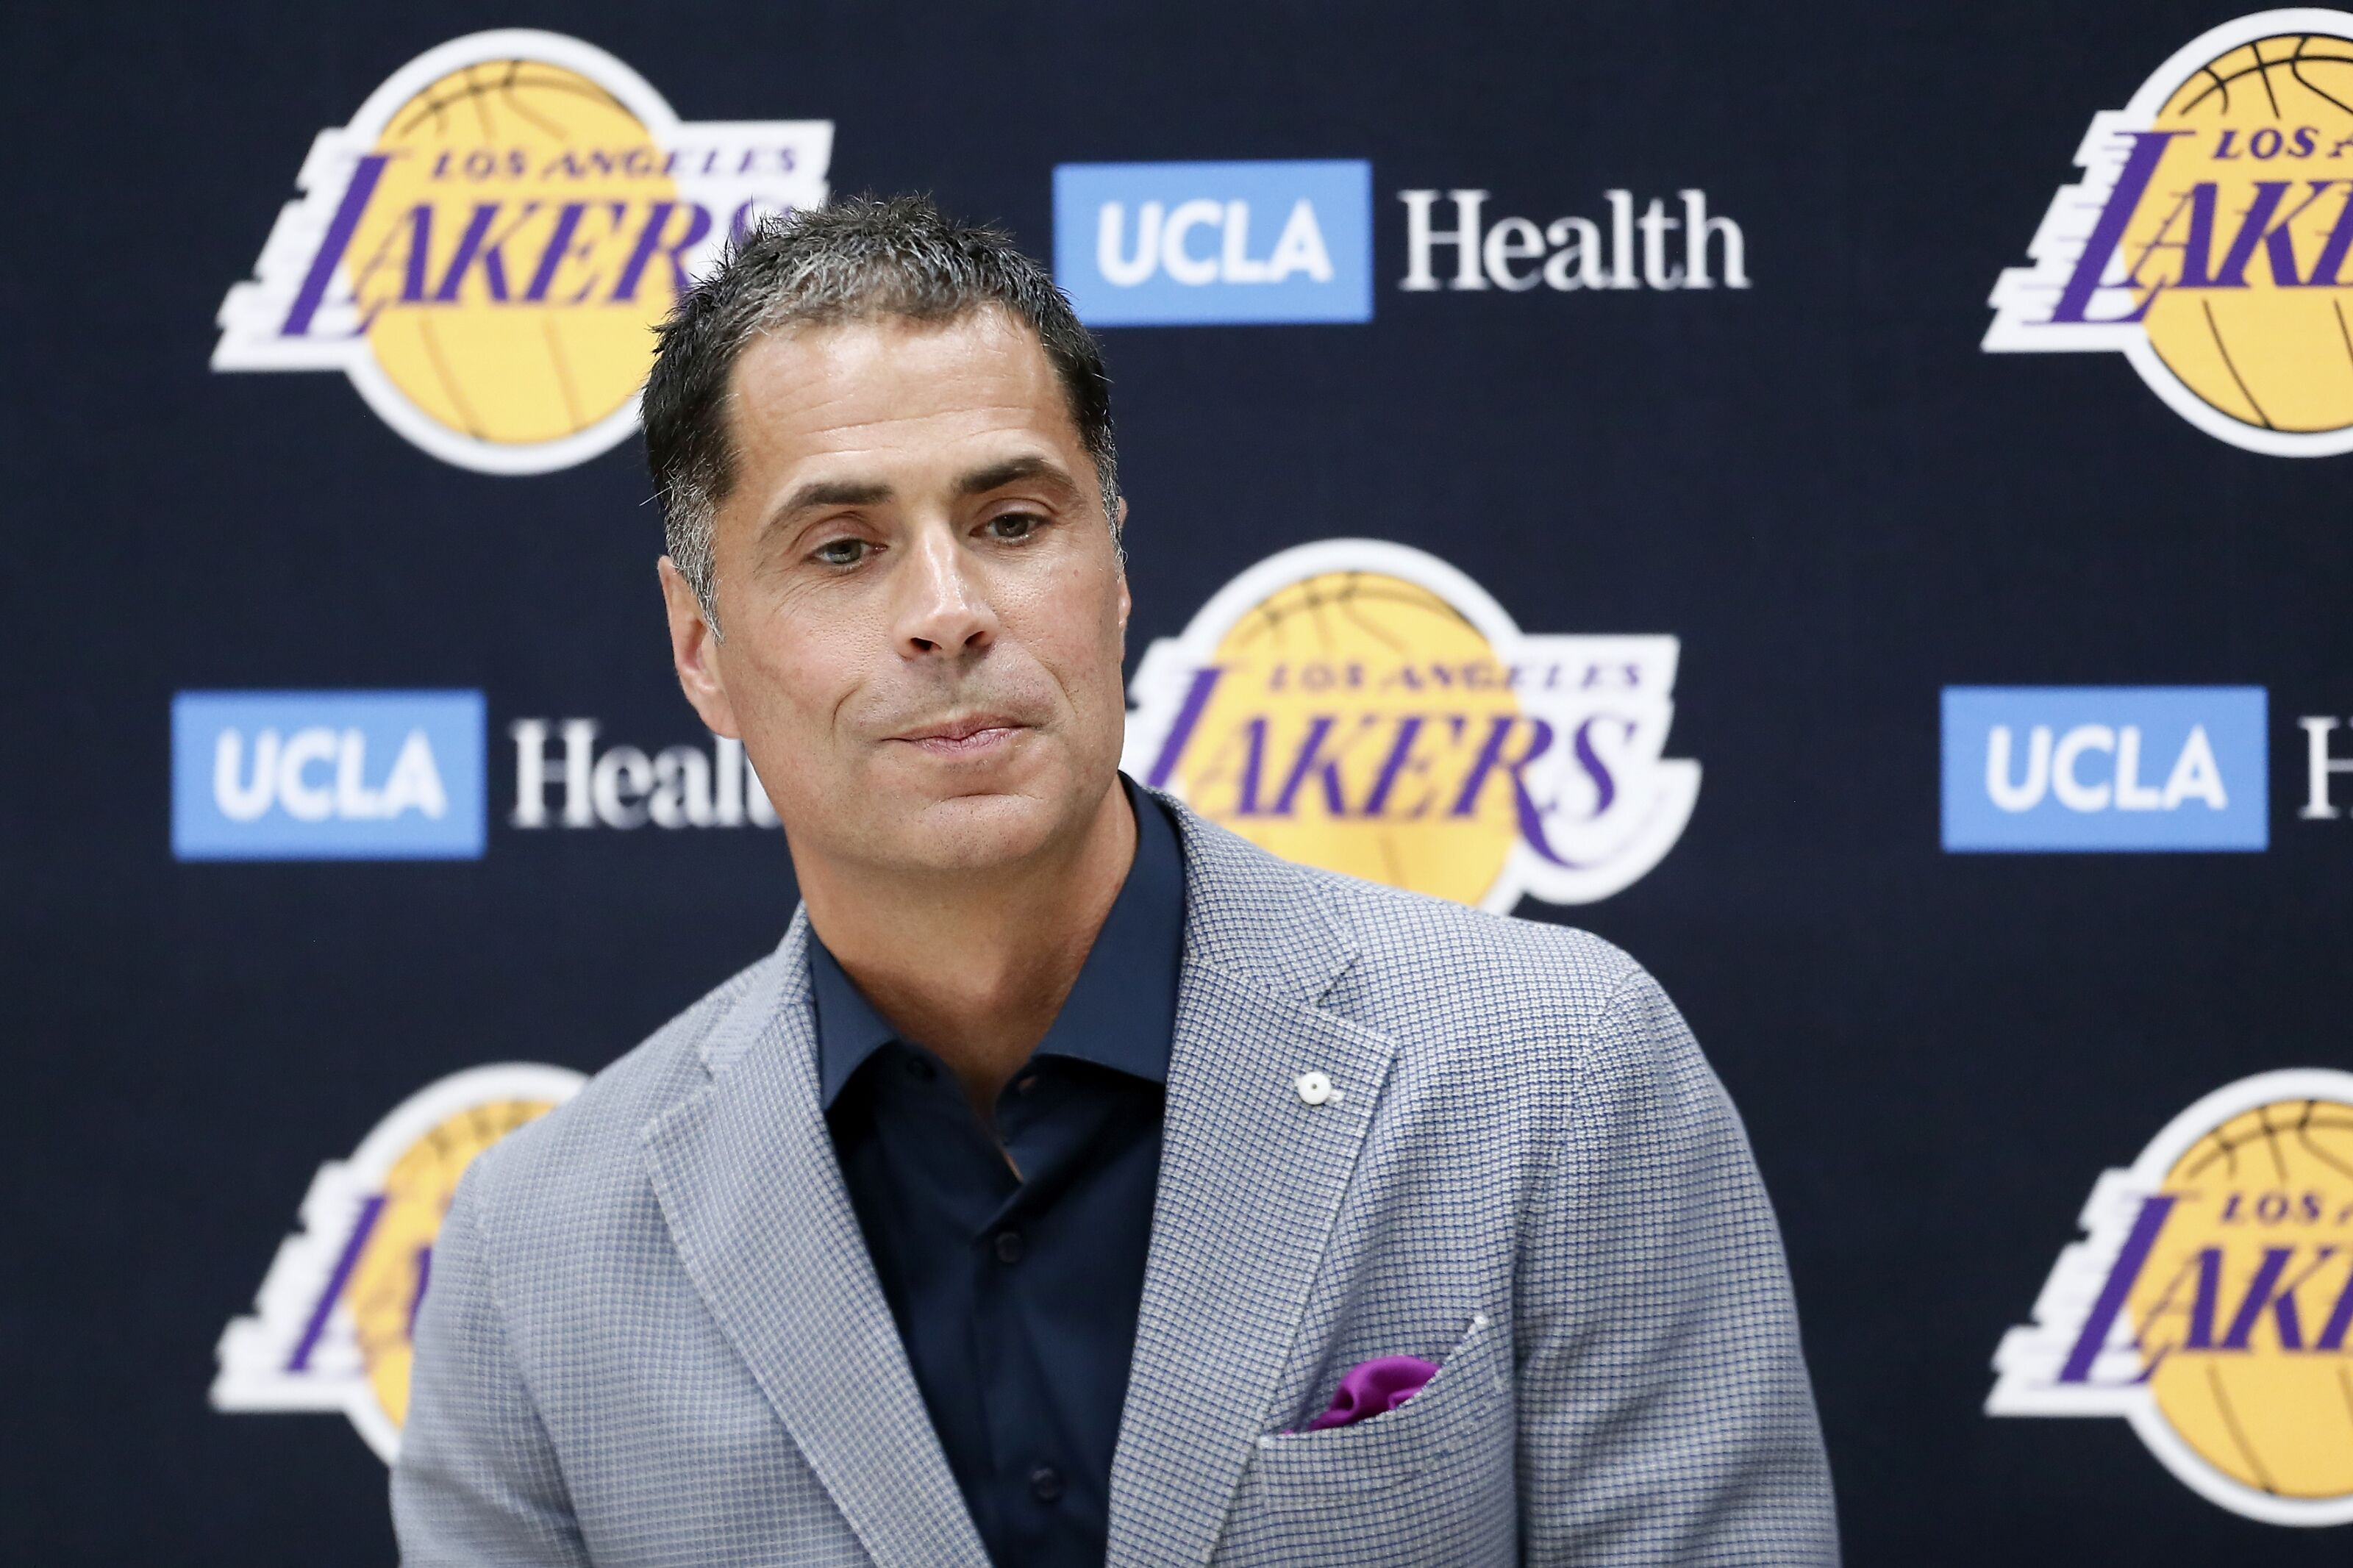 Los Angeles Lakers: Rob Pelinka believes team will have good chemistry